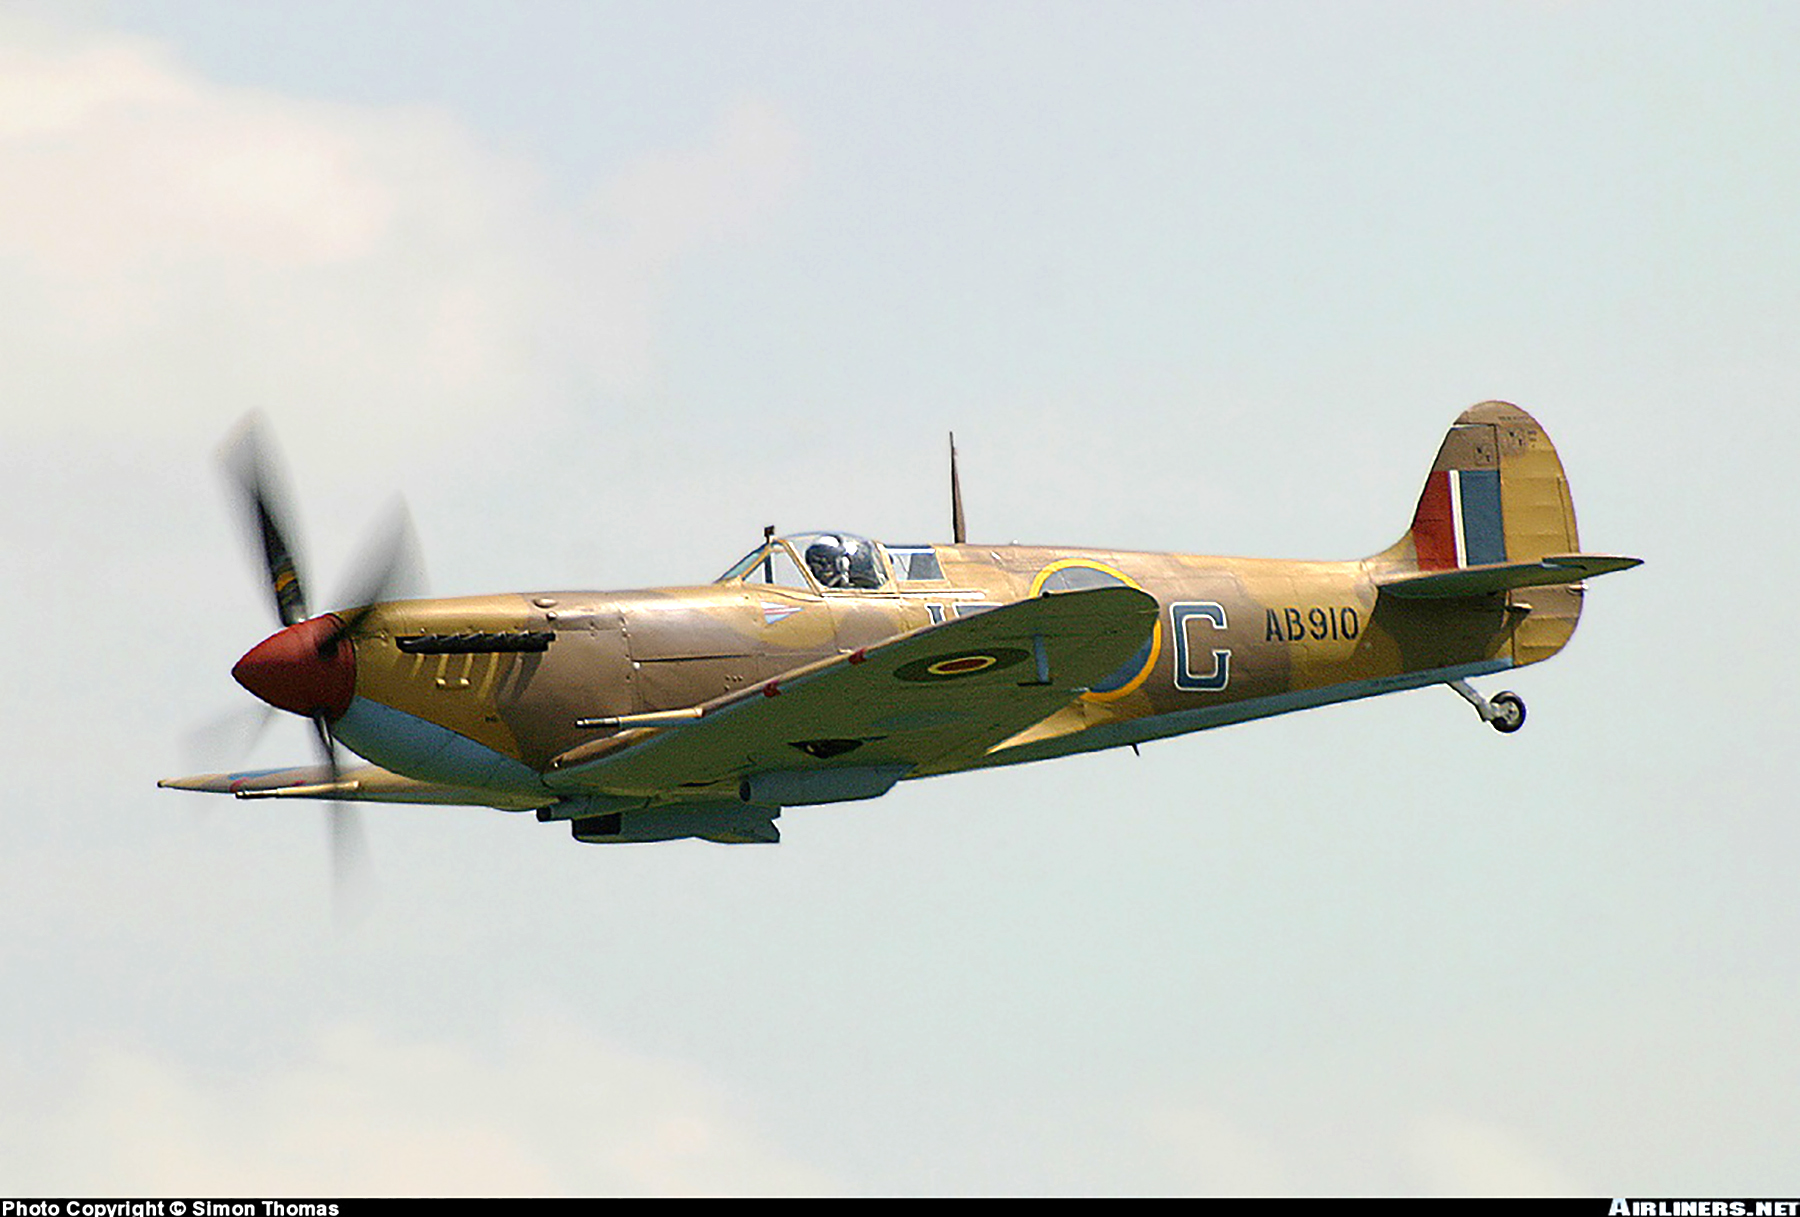 Airworthy Spitfire warbird RCAF 416Sqn IRG AB910 01